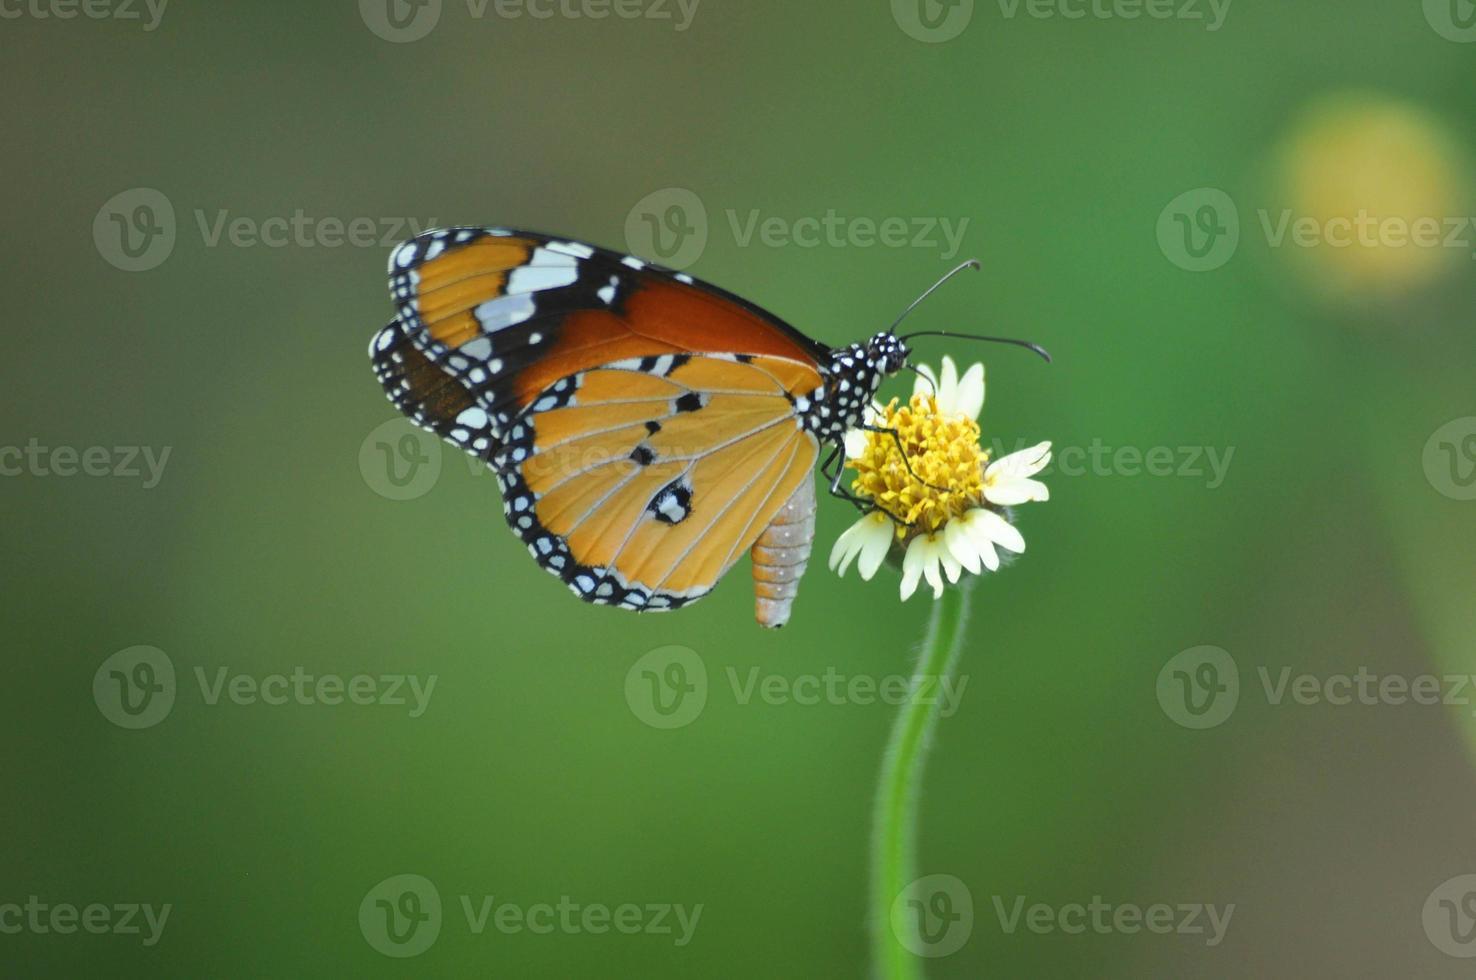 farfalla, lepidotteri, scarafaggi, falena foto